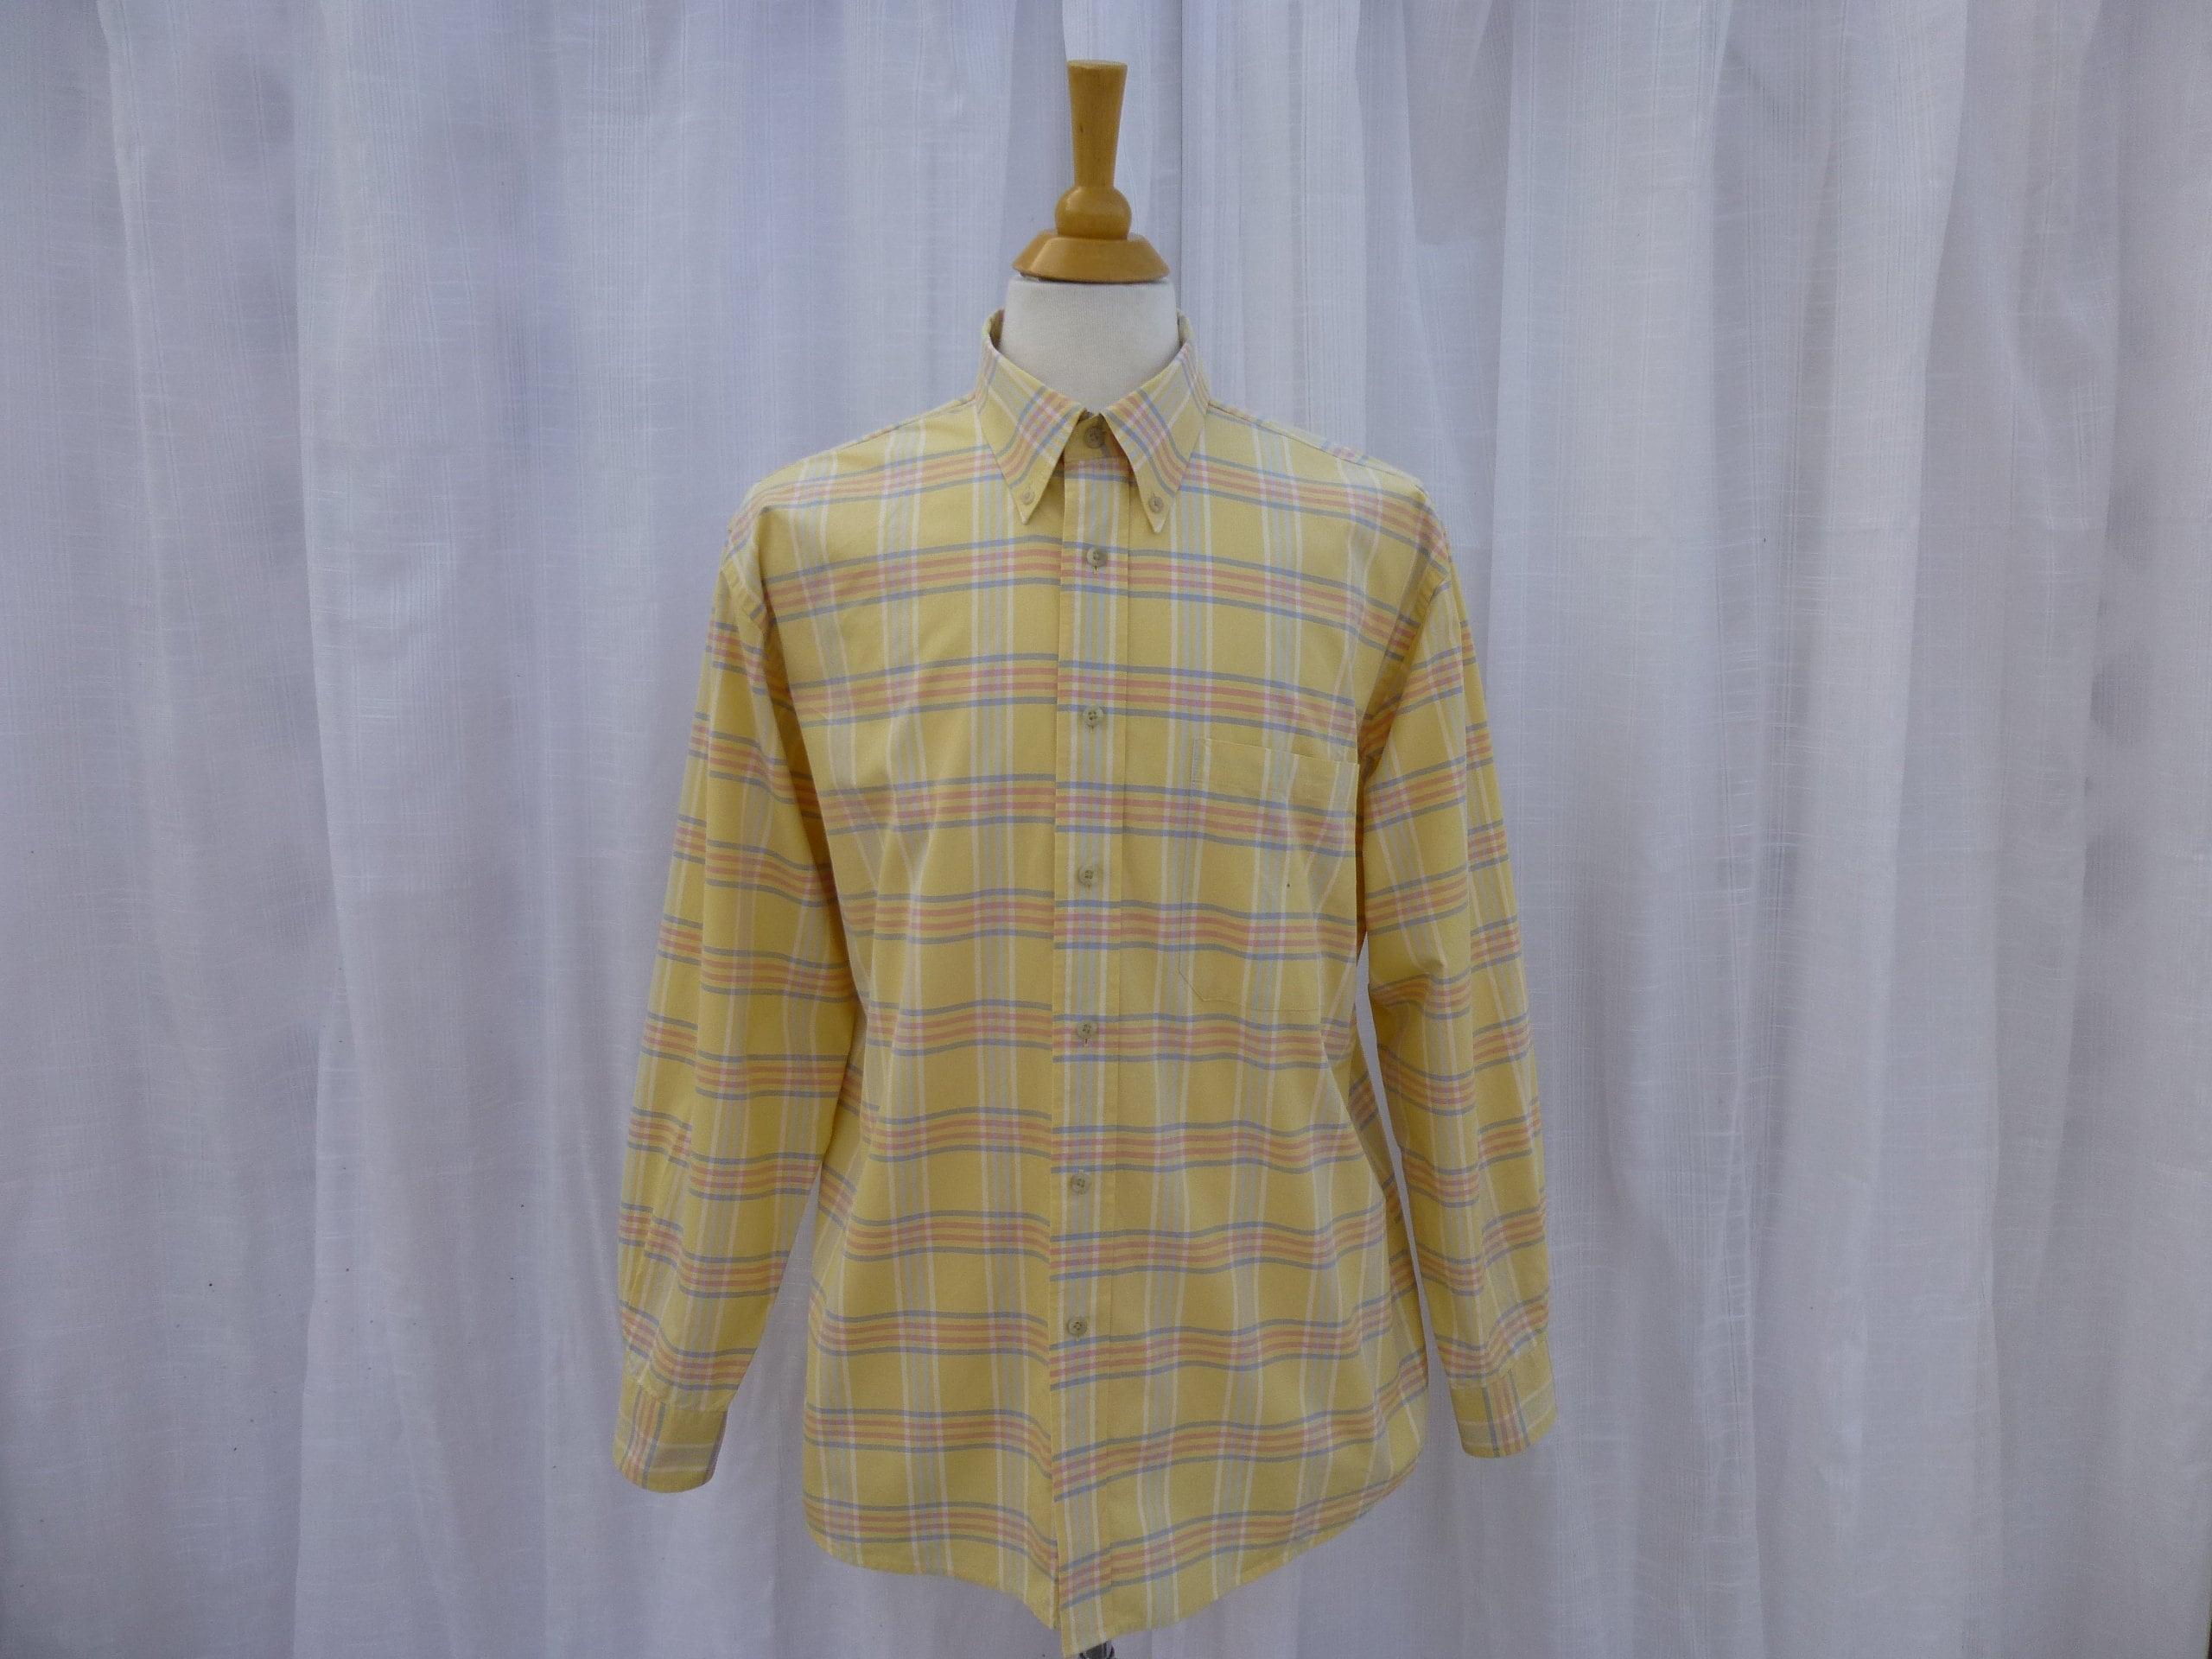 80s Dresses | Casual to Party Dresses Vintage 80S 90S Pendleton Woolen Mills Plaid 100 Cotton Dress Shirt Yellow Striped Check Button-Down Pocket  Read Description Glam Garb $5.00 AT vintagedancer.com